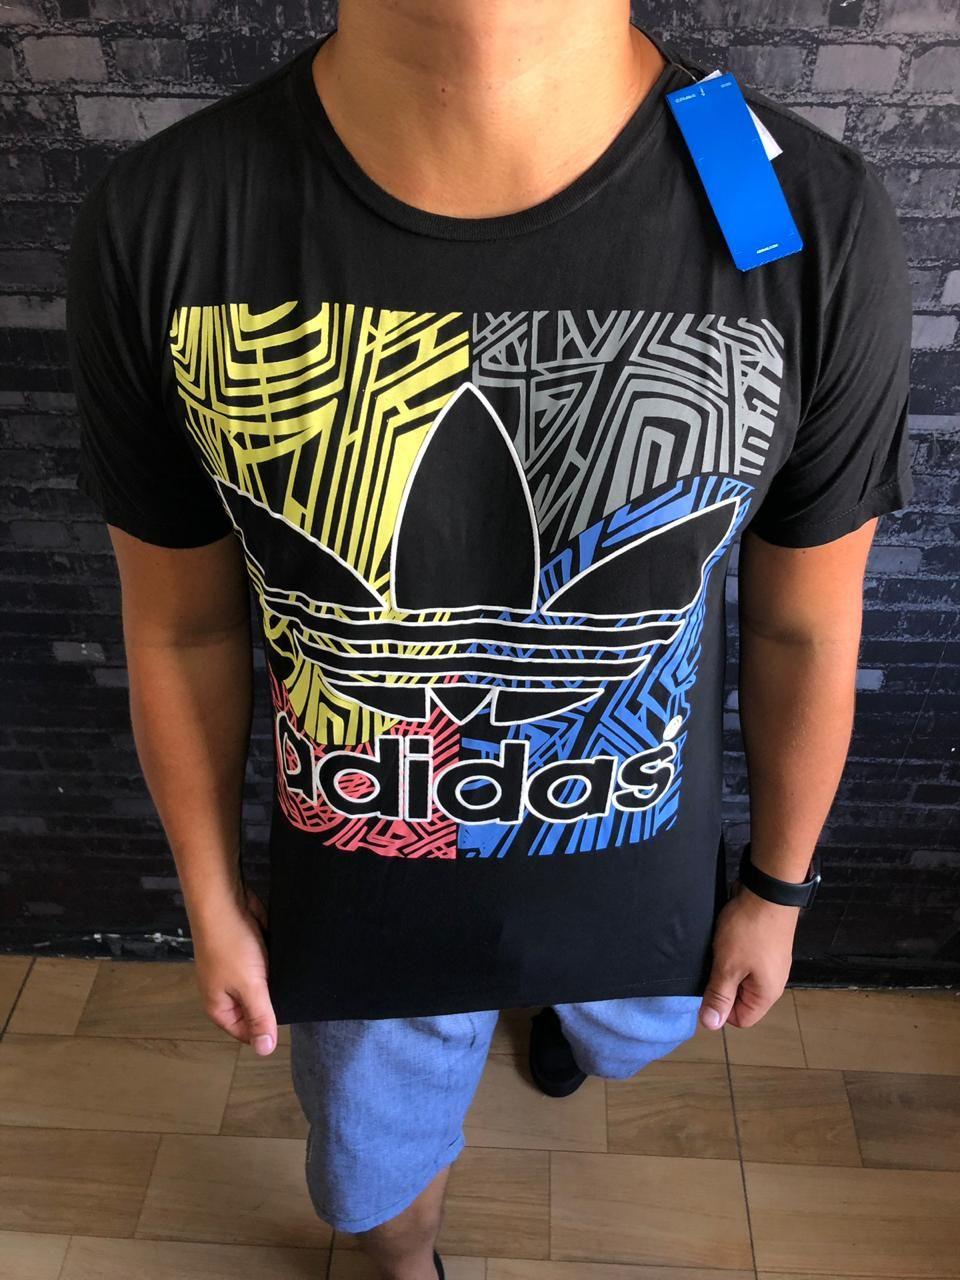 b023e74f1 kit 10 Camisetas Camisas Masculinas Marcas Famosas ATACADO   Nesse kit de  camisas masculinas atacado